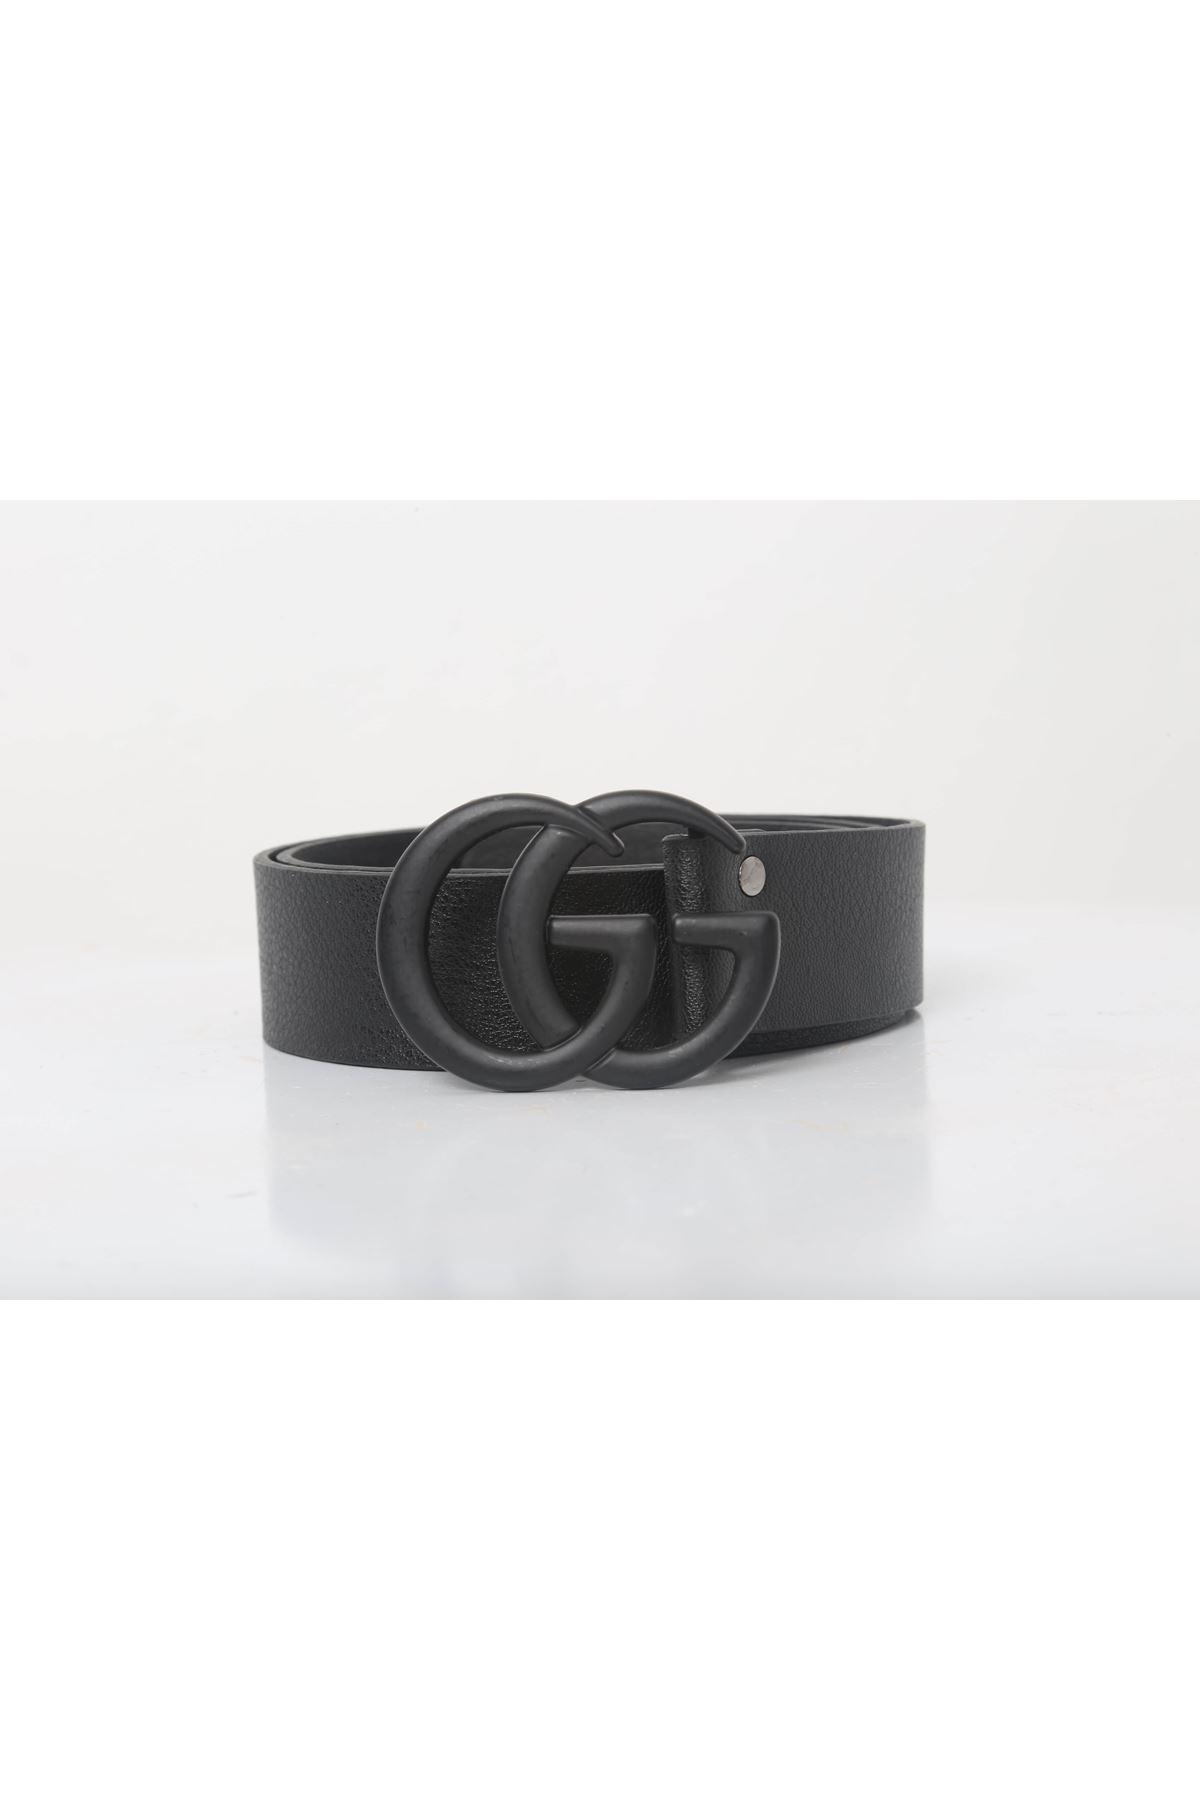 G & G Tokalı Mat Kemer- Mat Siyah